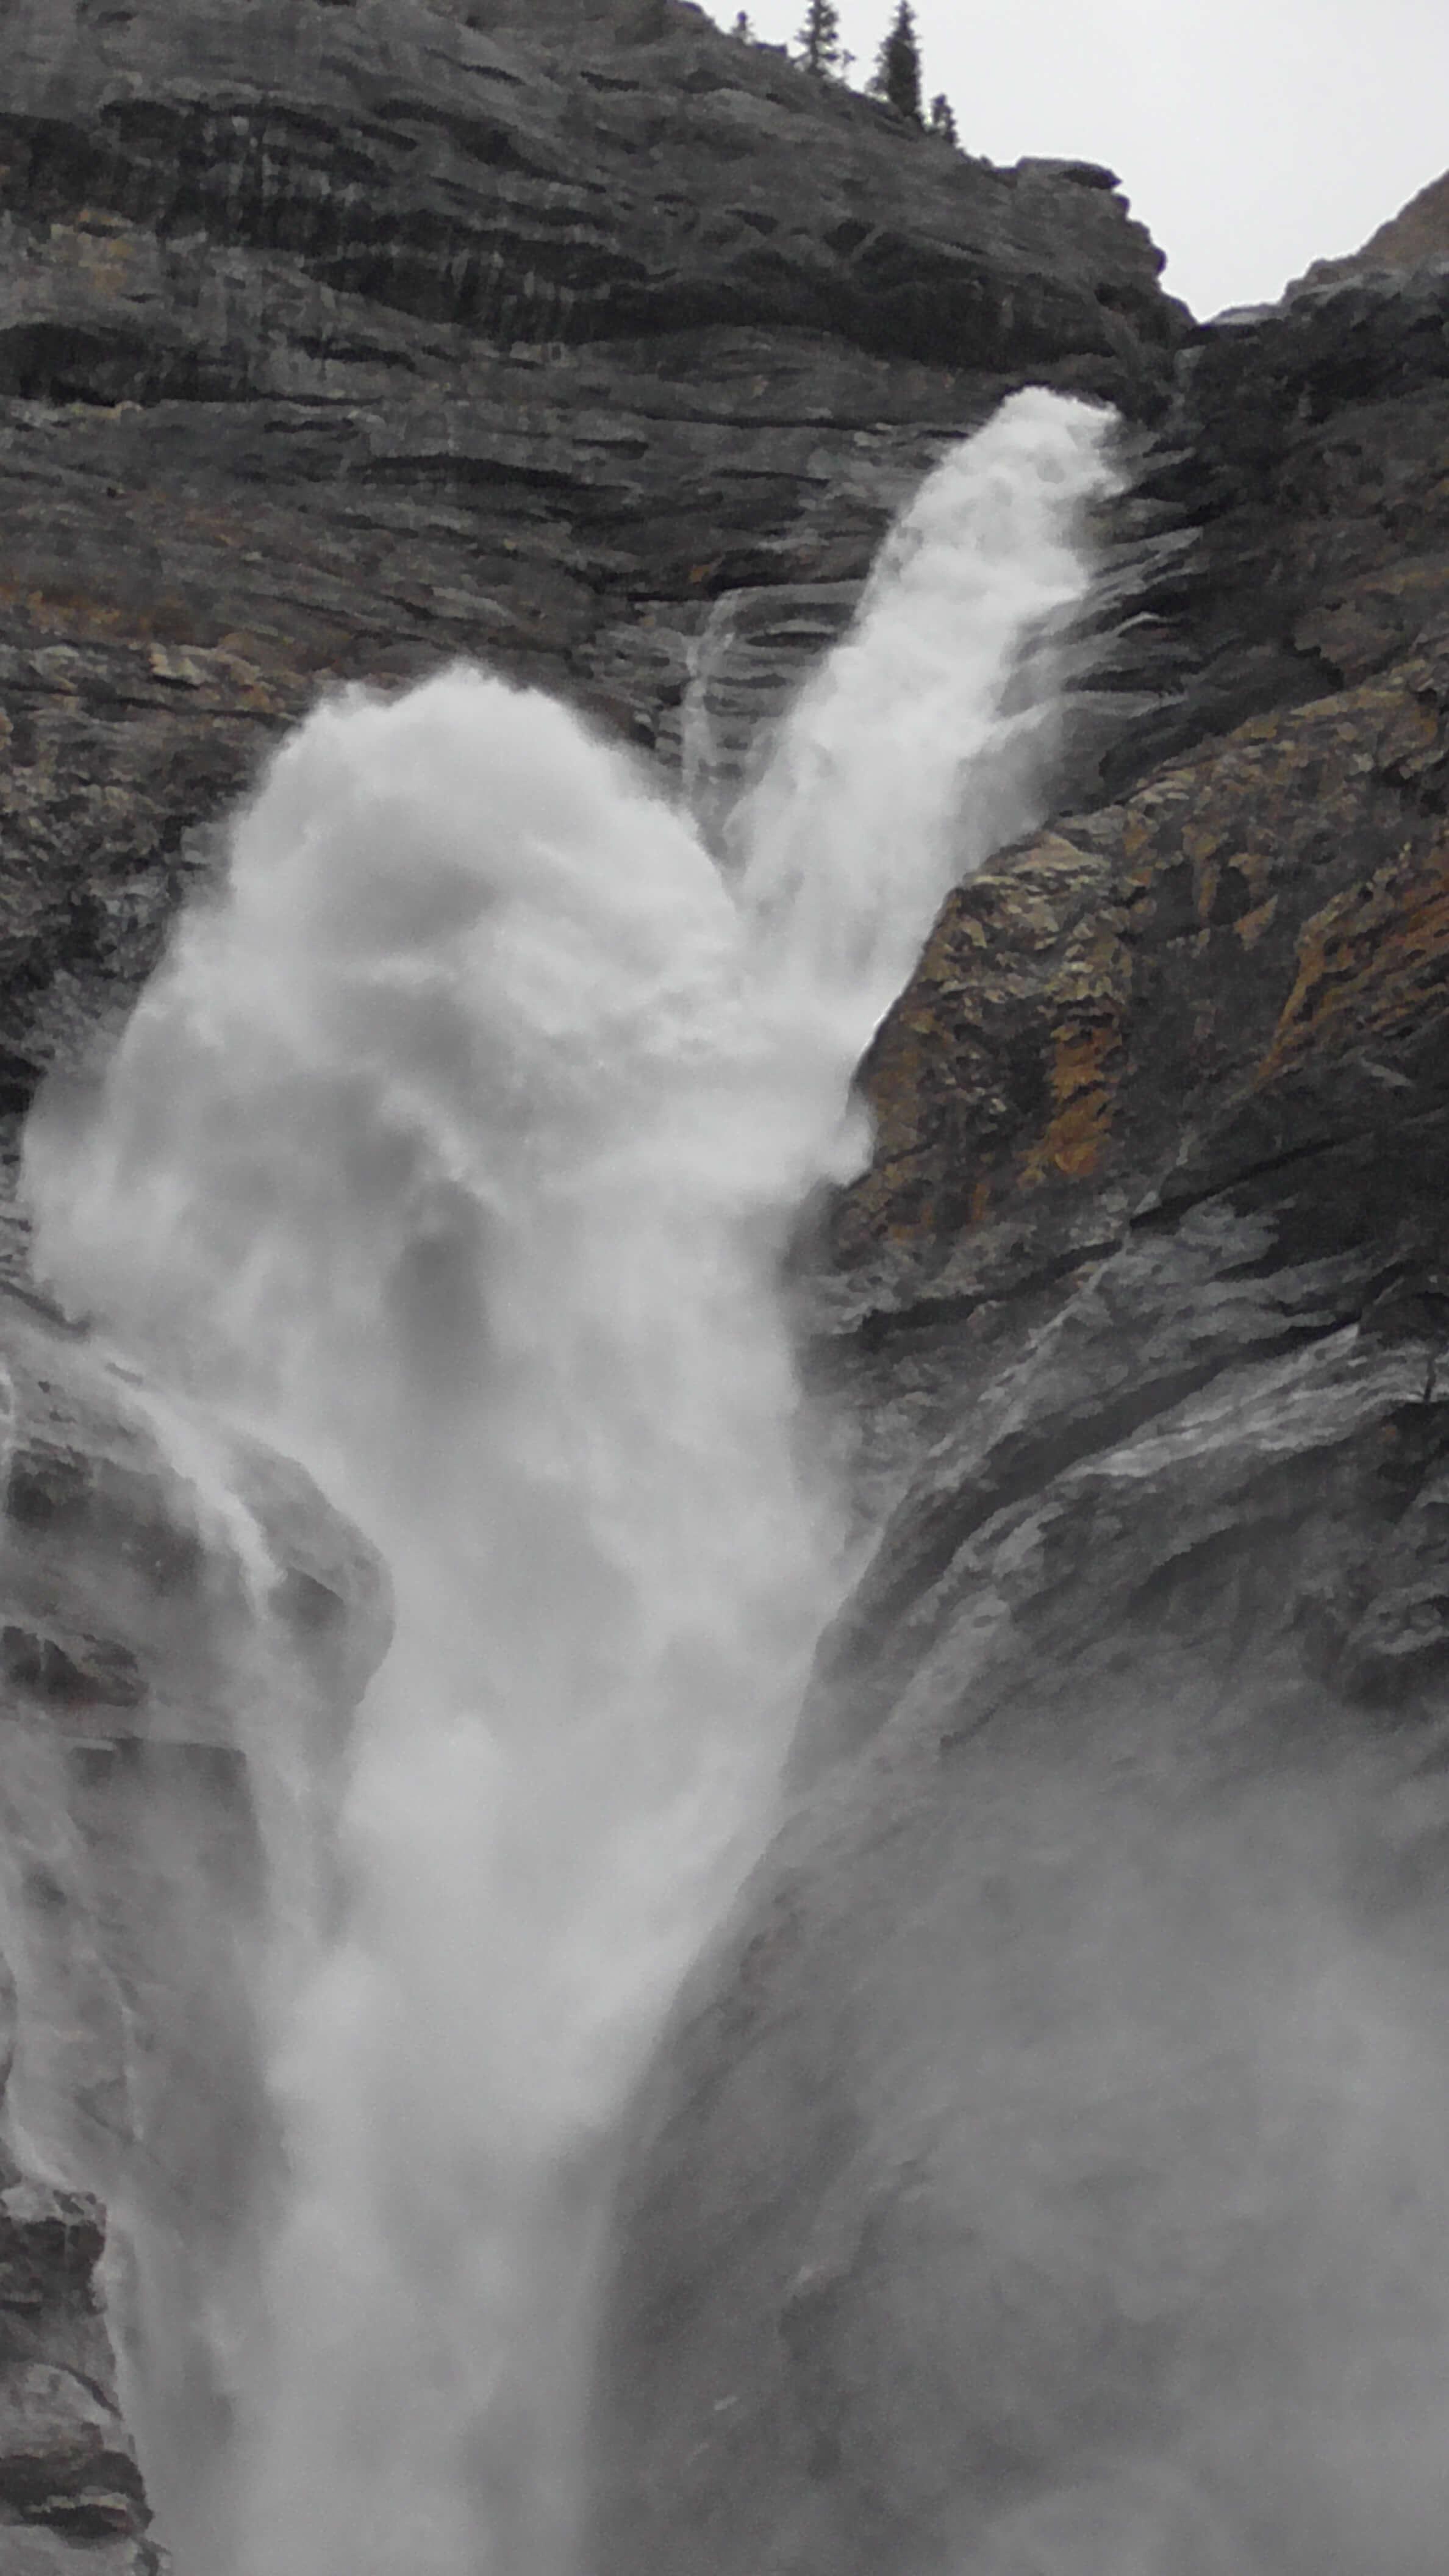 Takakkaw Falls, Yoho National Park, British Columbia